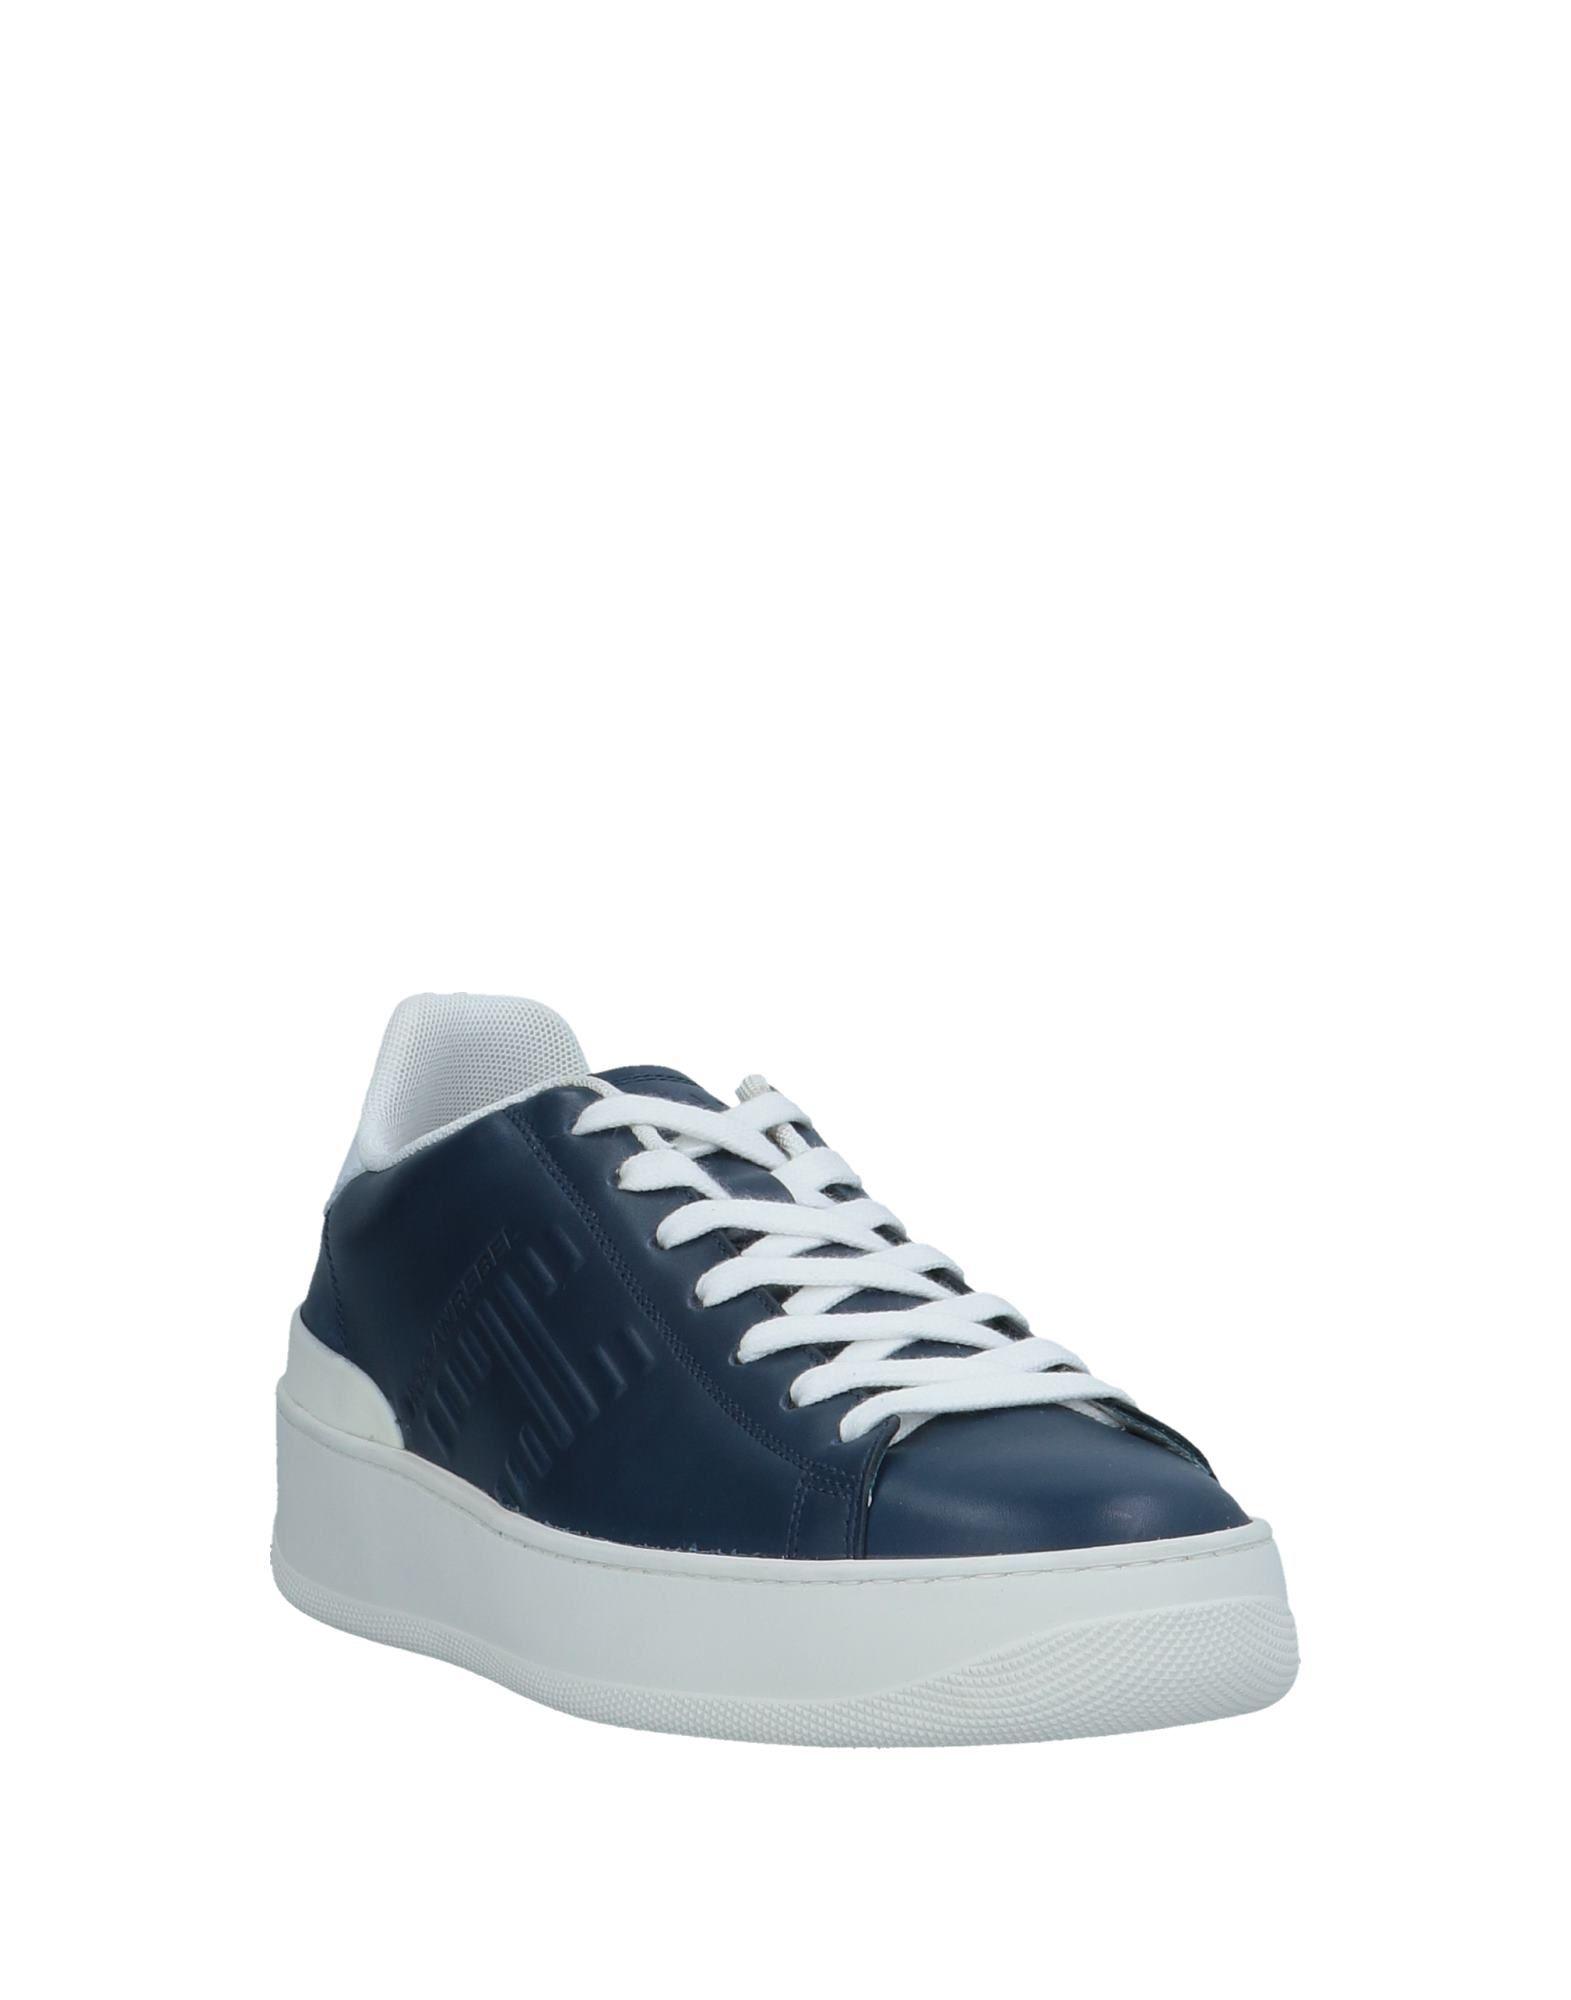 Hogan Rebel Sneakers Herren  11298450VL Gute Gute 11298450VL Qualität beliebte Schuhe ac6df8